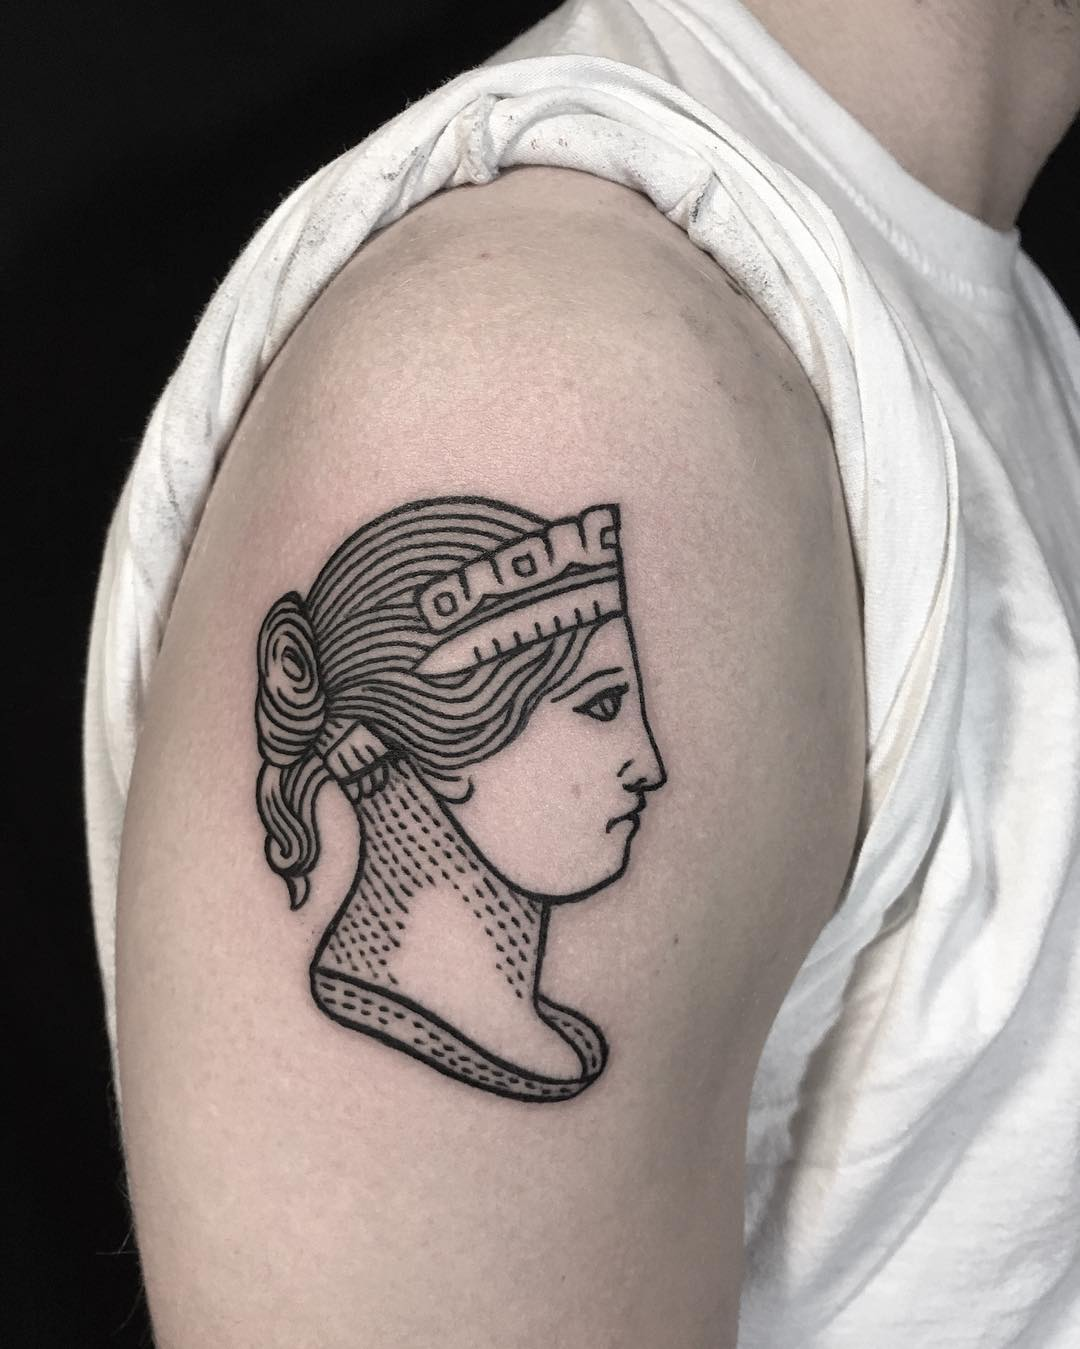 A very rare Indian stamp Half Anna tattoo by @ryanjessiman